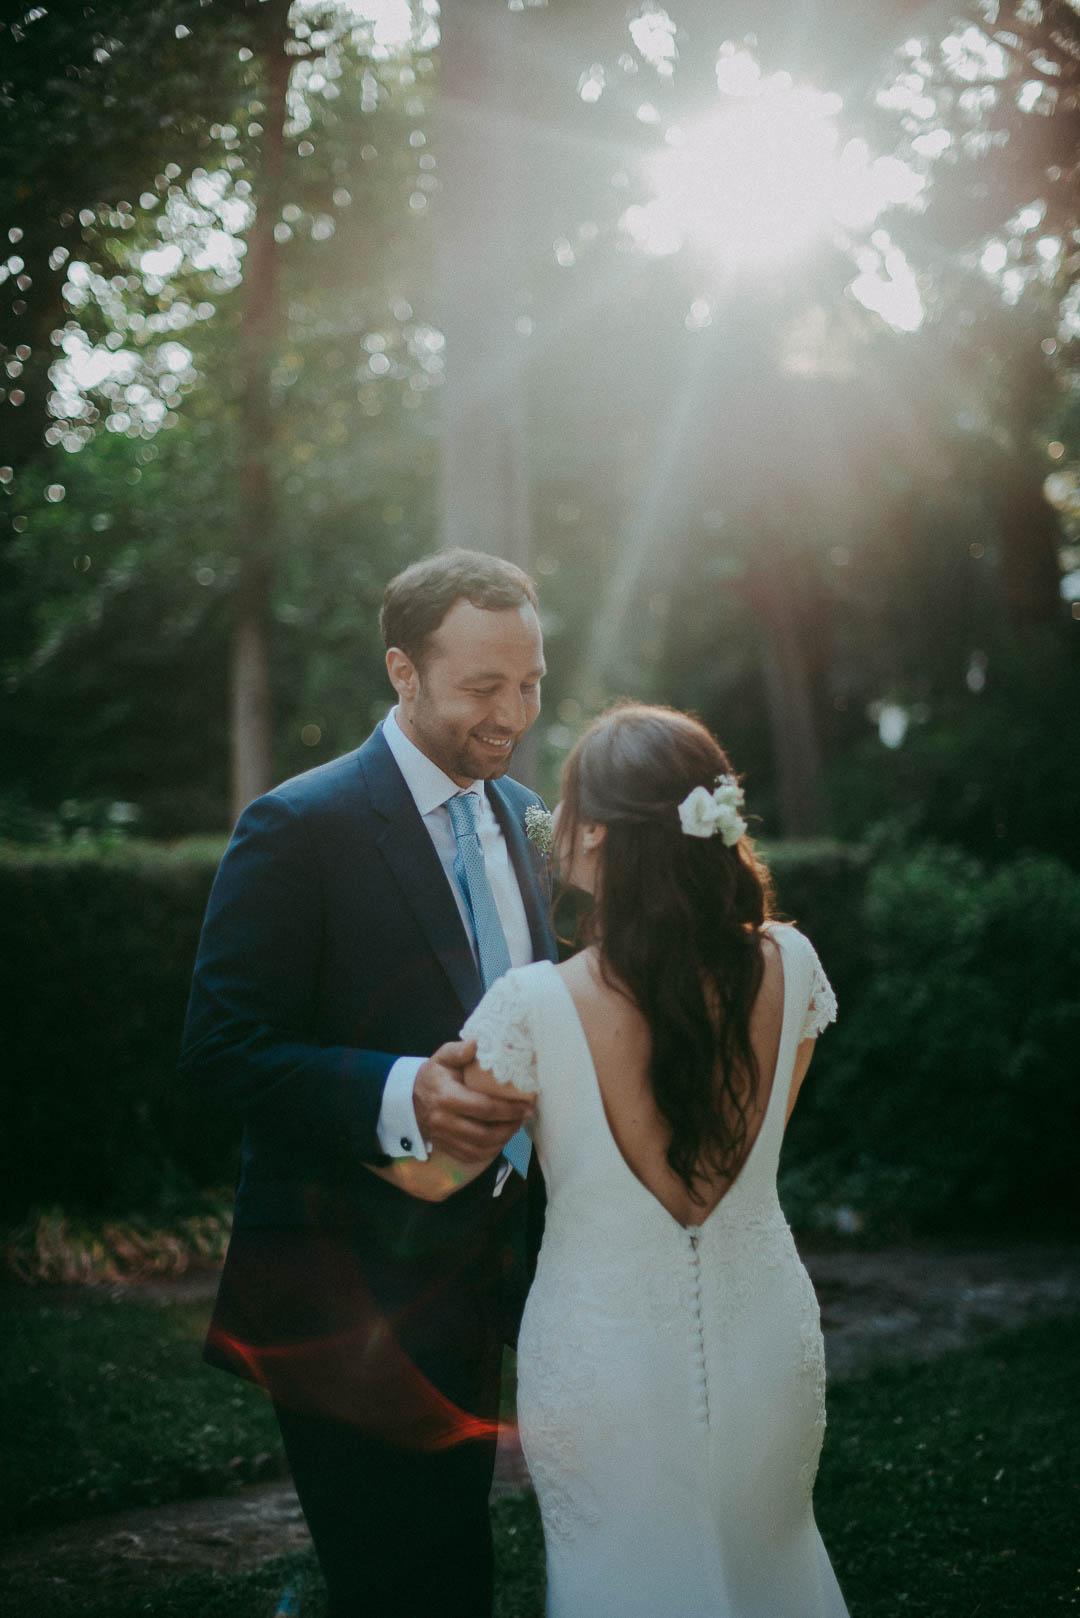 wedding-photographer-destination-fineart-bespoke-reportage-sorrento-parcodeiprincipi-vivianeizzo-spazio46-83